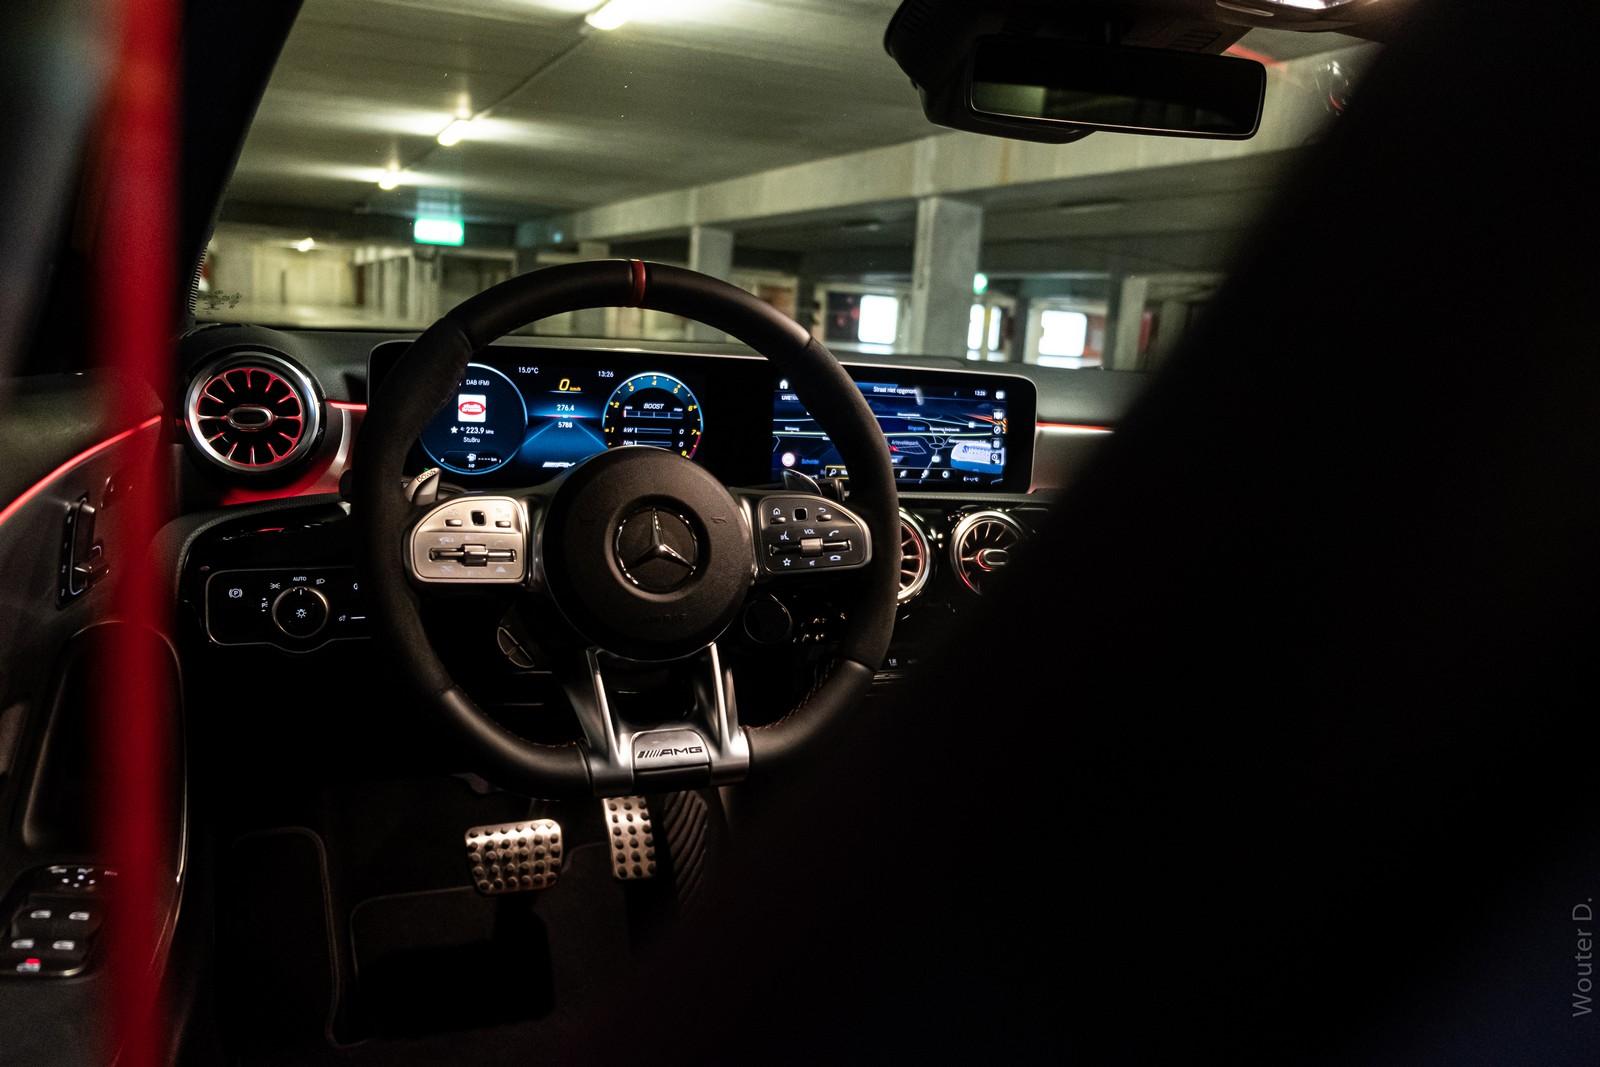 Mercedes-AMG A45 S Steering Wheel